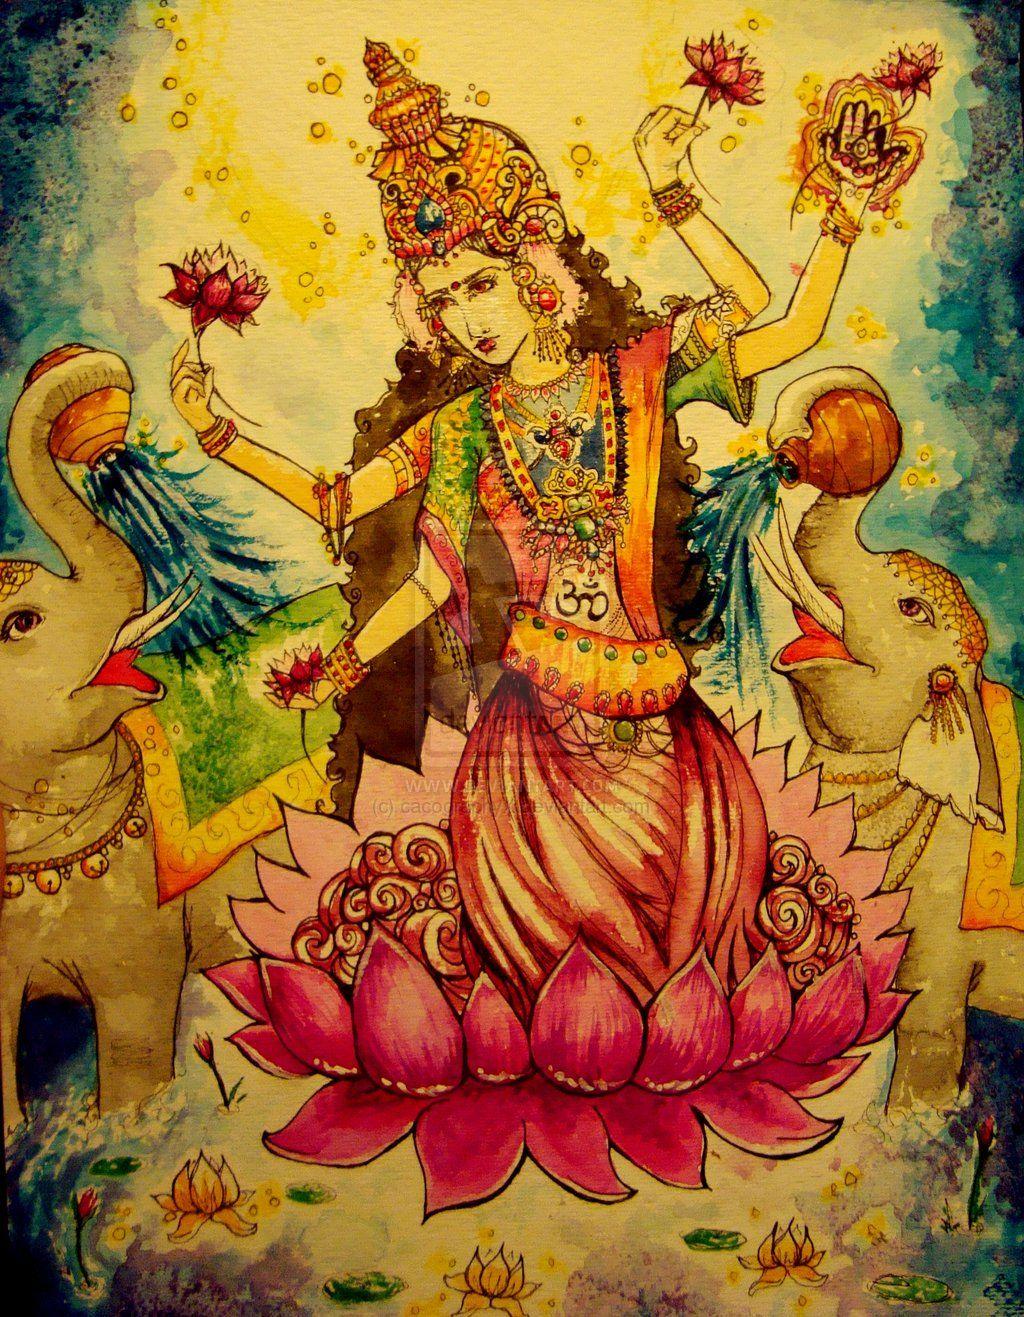 Kamat's Potpourri: Deity Laxmi in Mysore School of Art